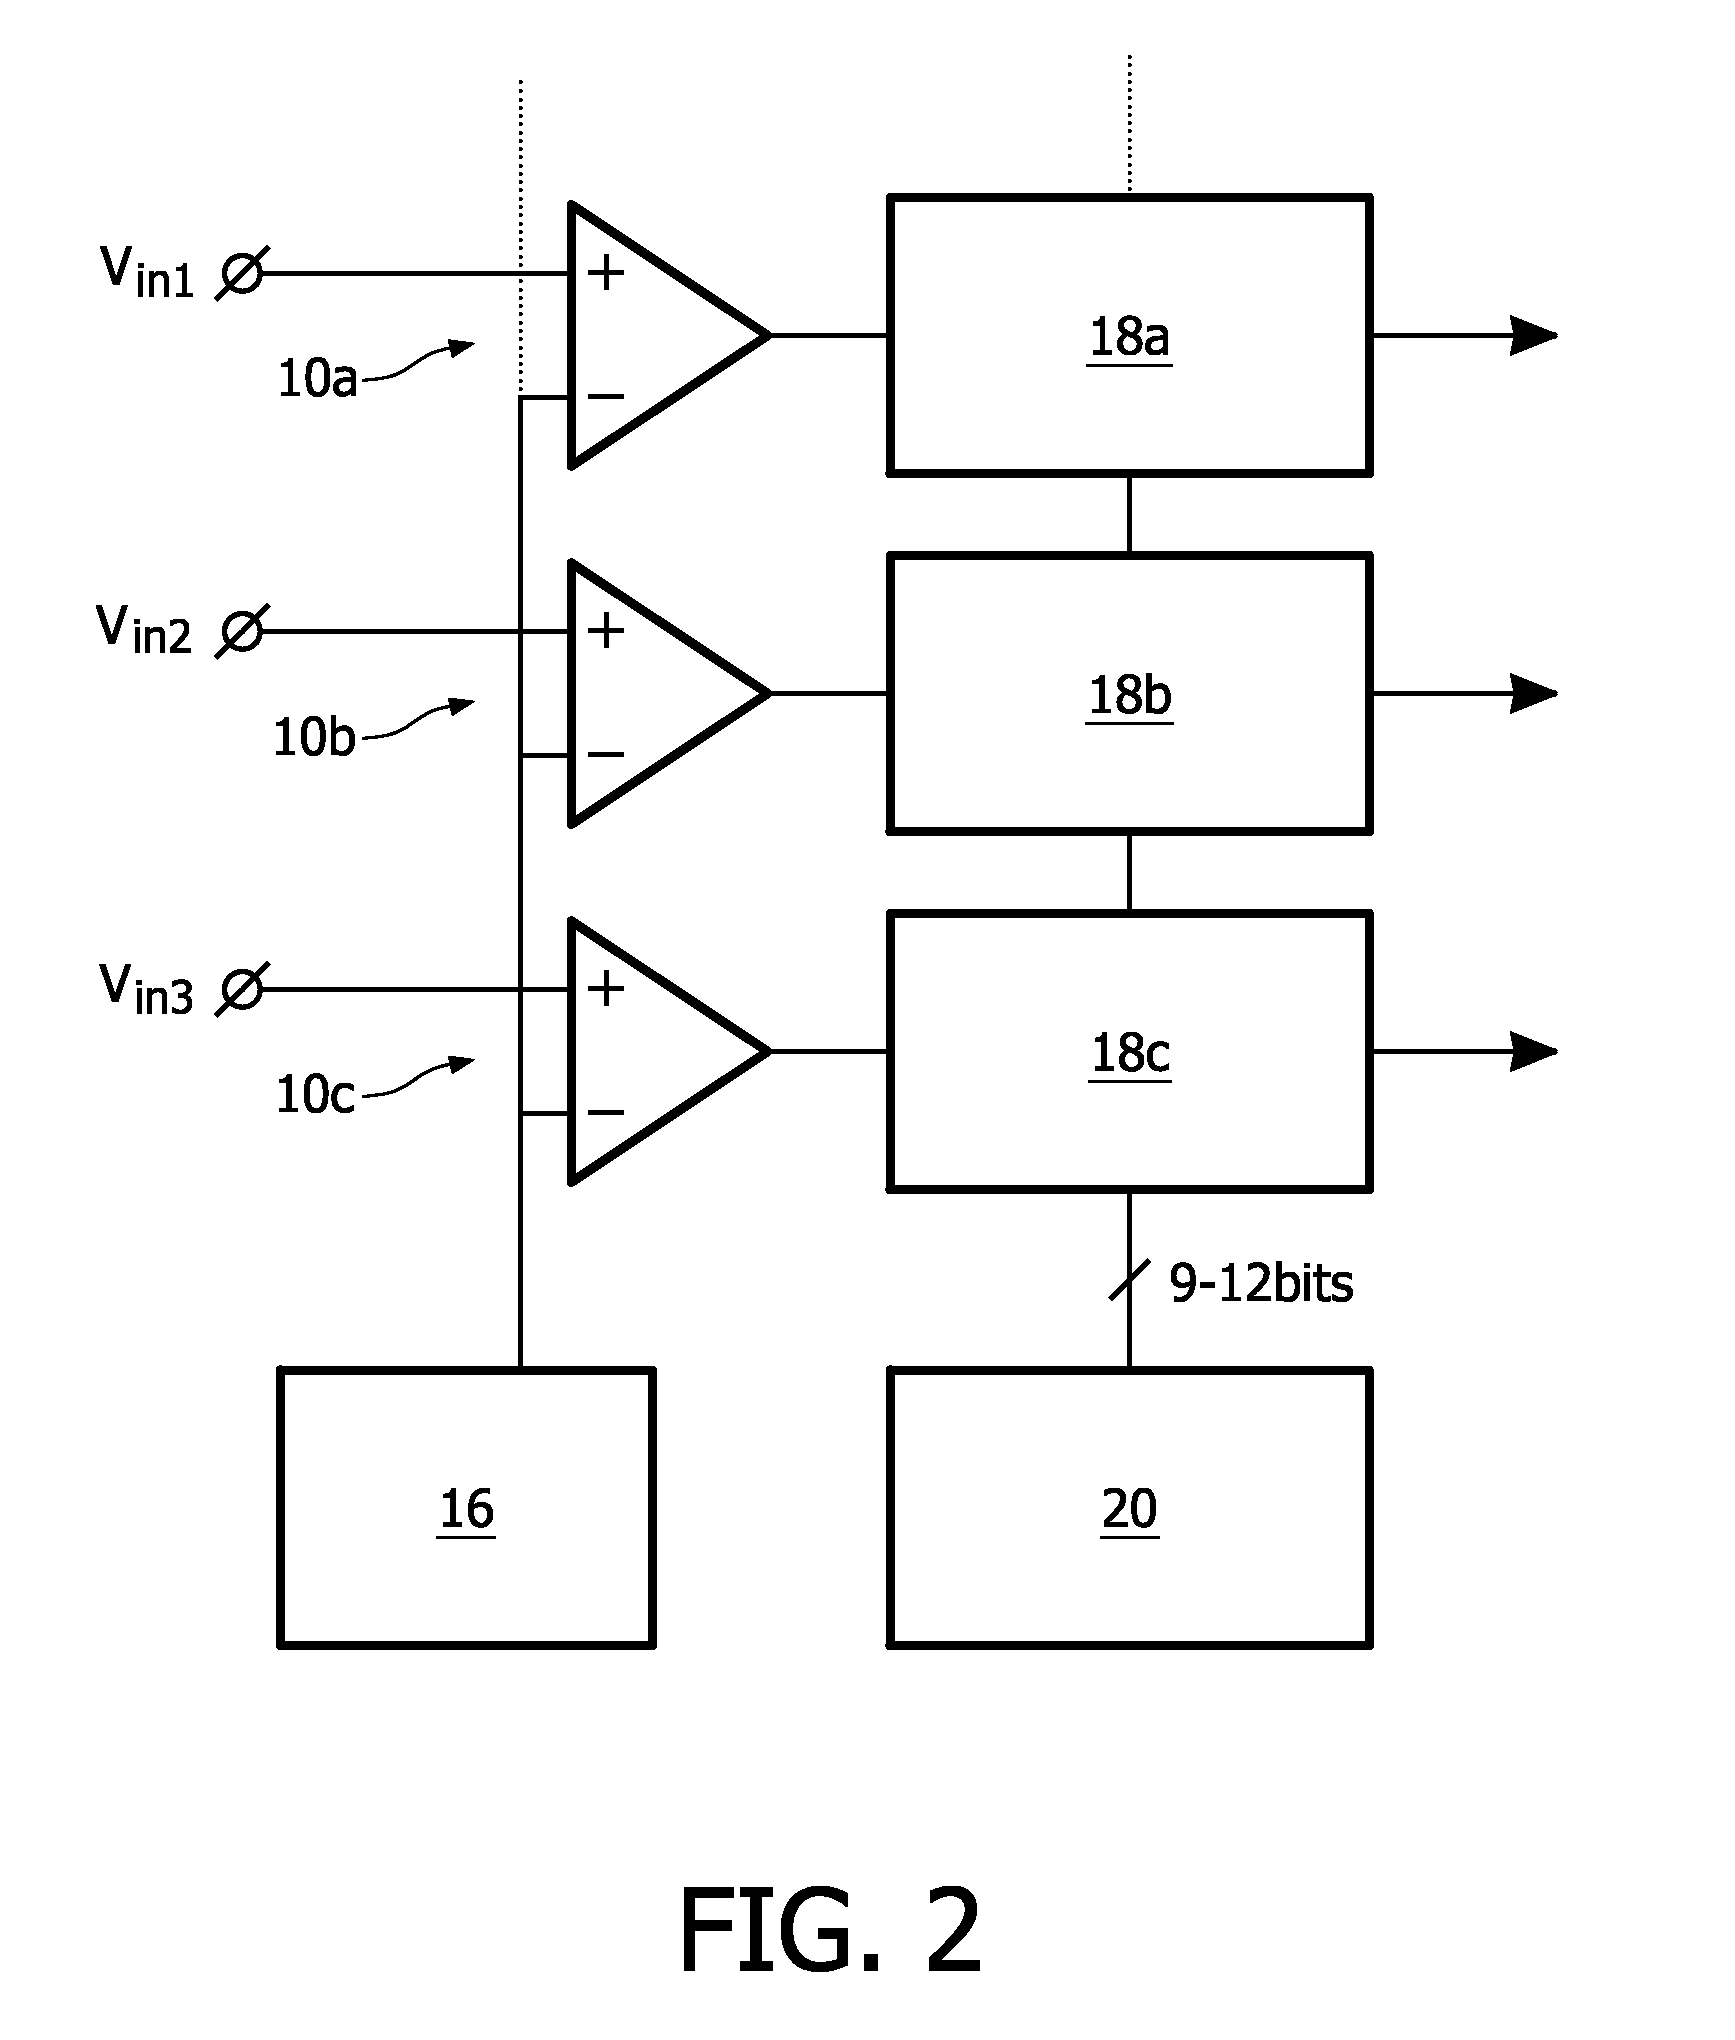 Us20090195431 Single Slope Analog To Digital Comparator Block Diagram Patent Drawing